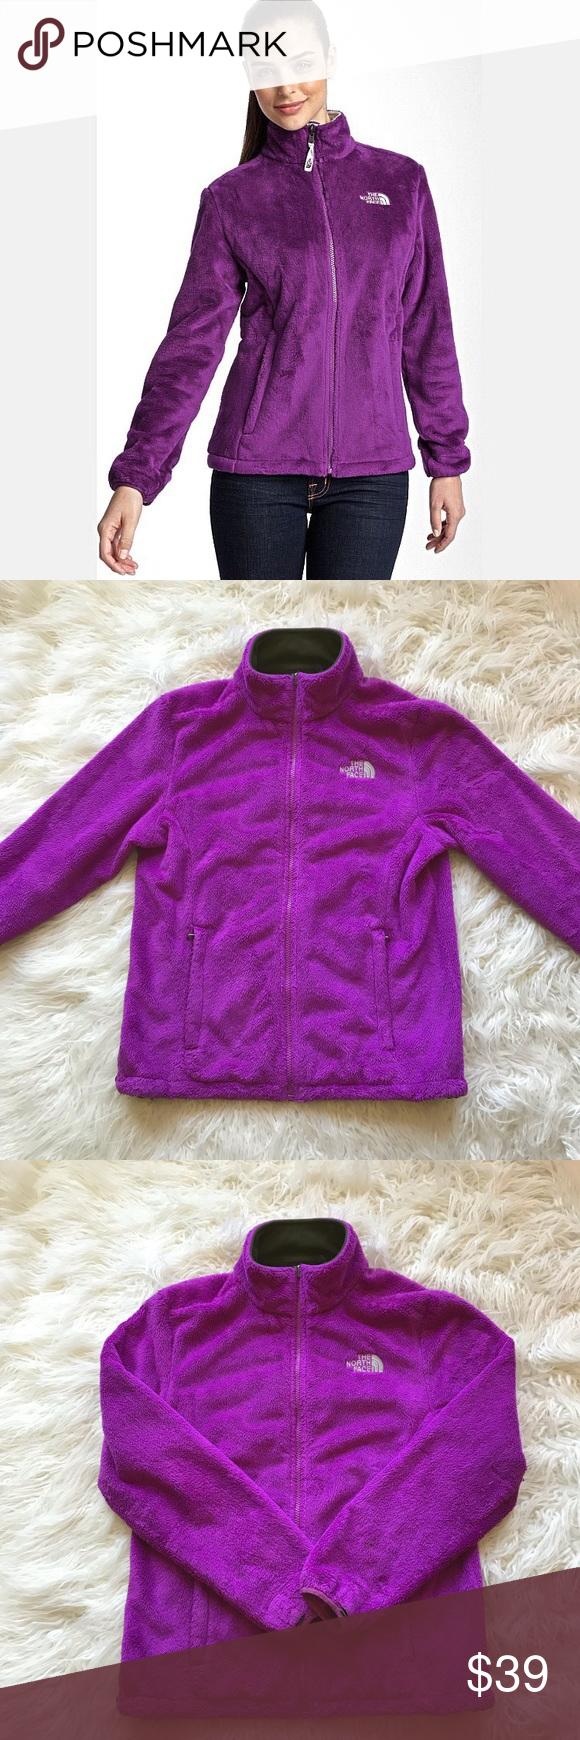 The North Face Purple Osito Fleece Jacket Fleece Jacket North Face Jacket Clothes Design [ 1740 x 580 Pixel ]